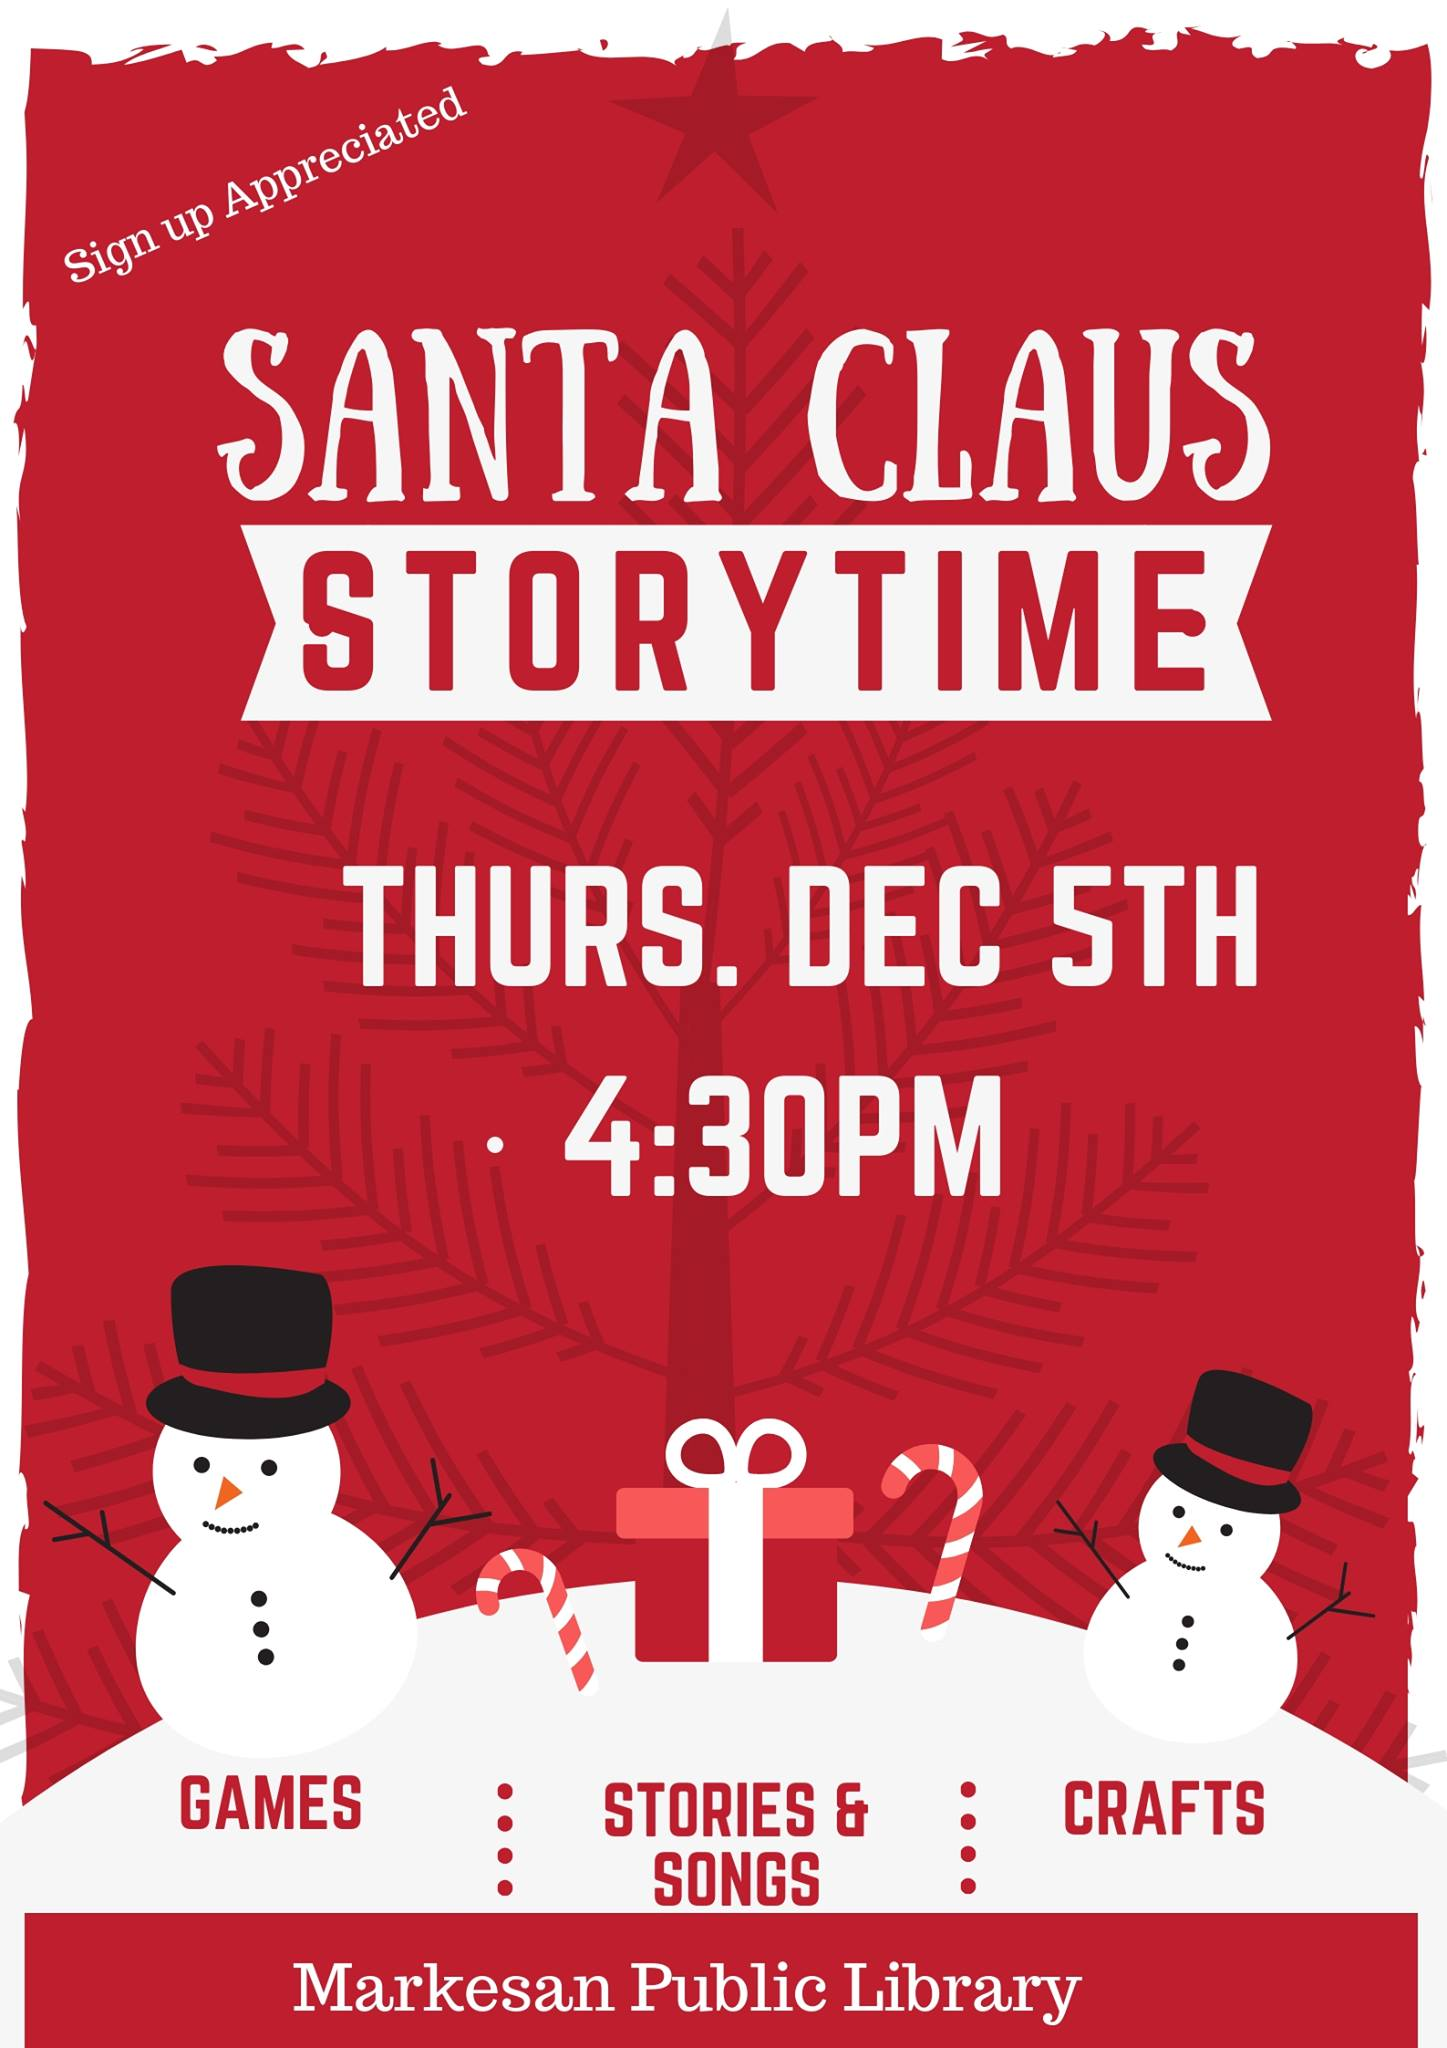 Santa Claus Story Hour